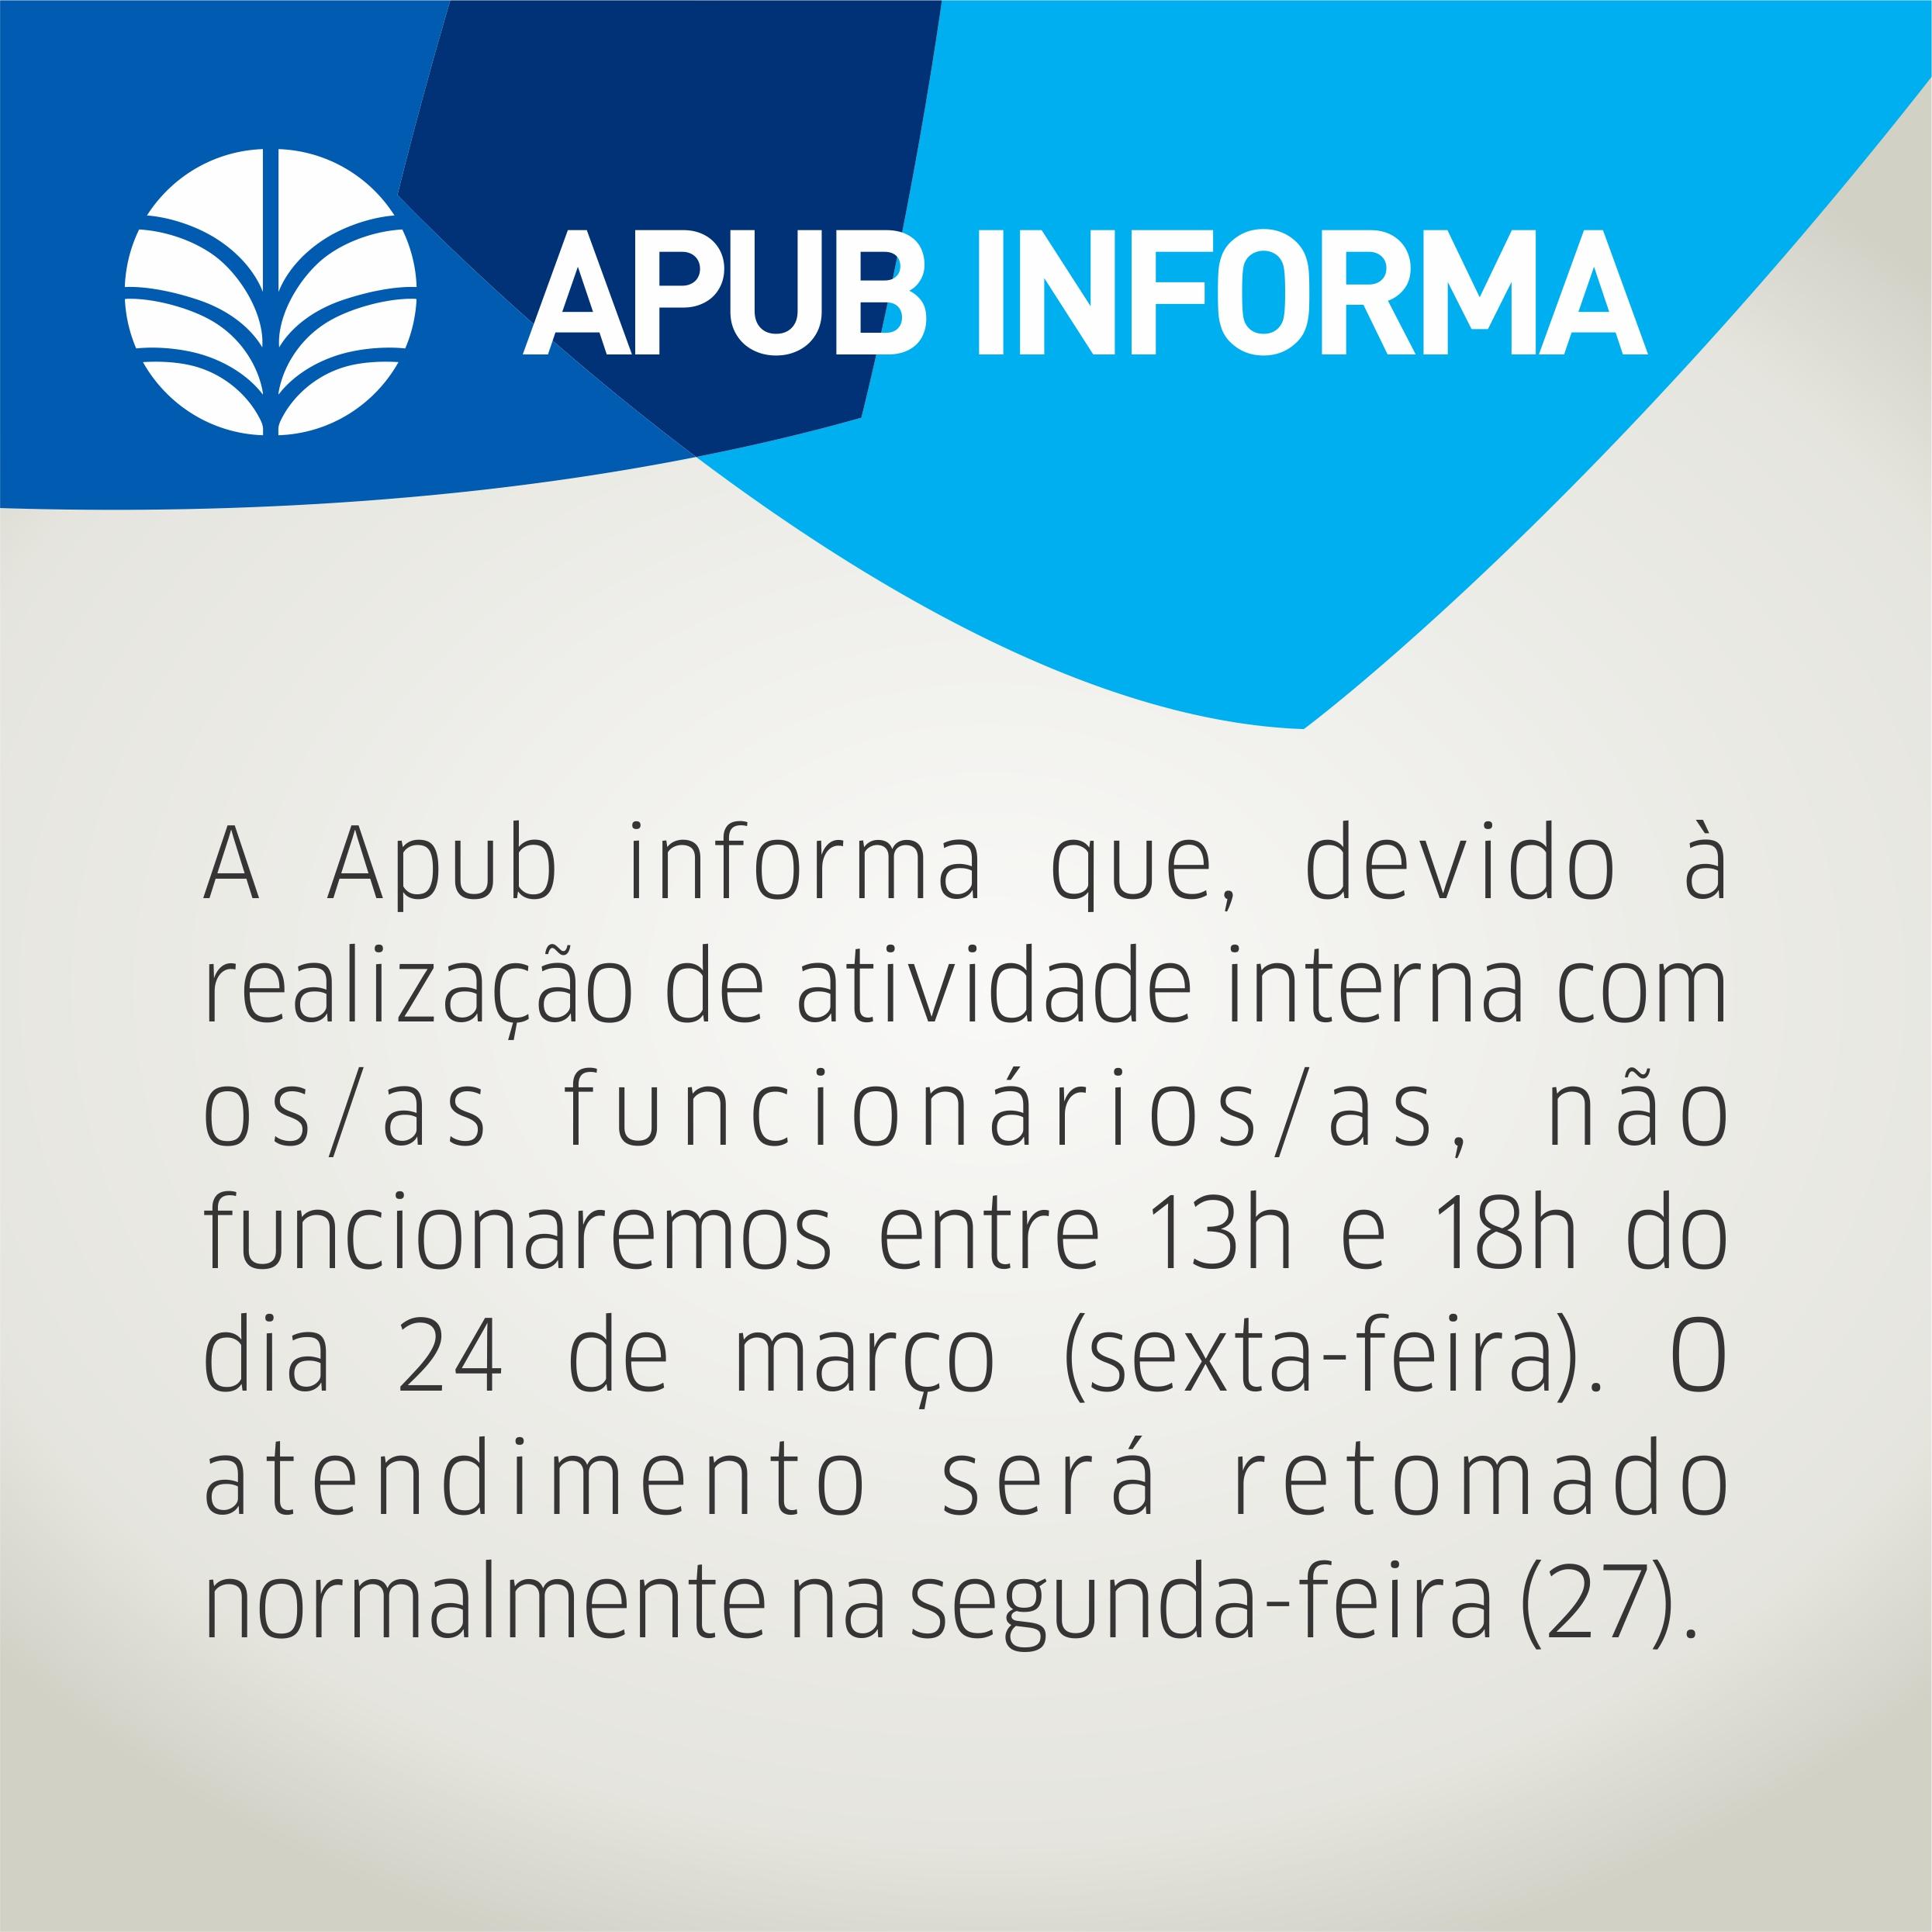 http://www.apub.org.br/wp-content/uploads/2017/03/CARD-APUB-INFORMA-24-de-marco.jpg